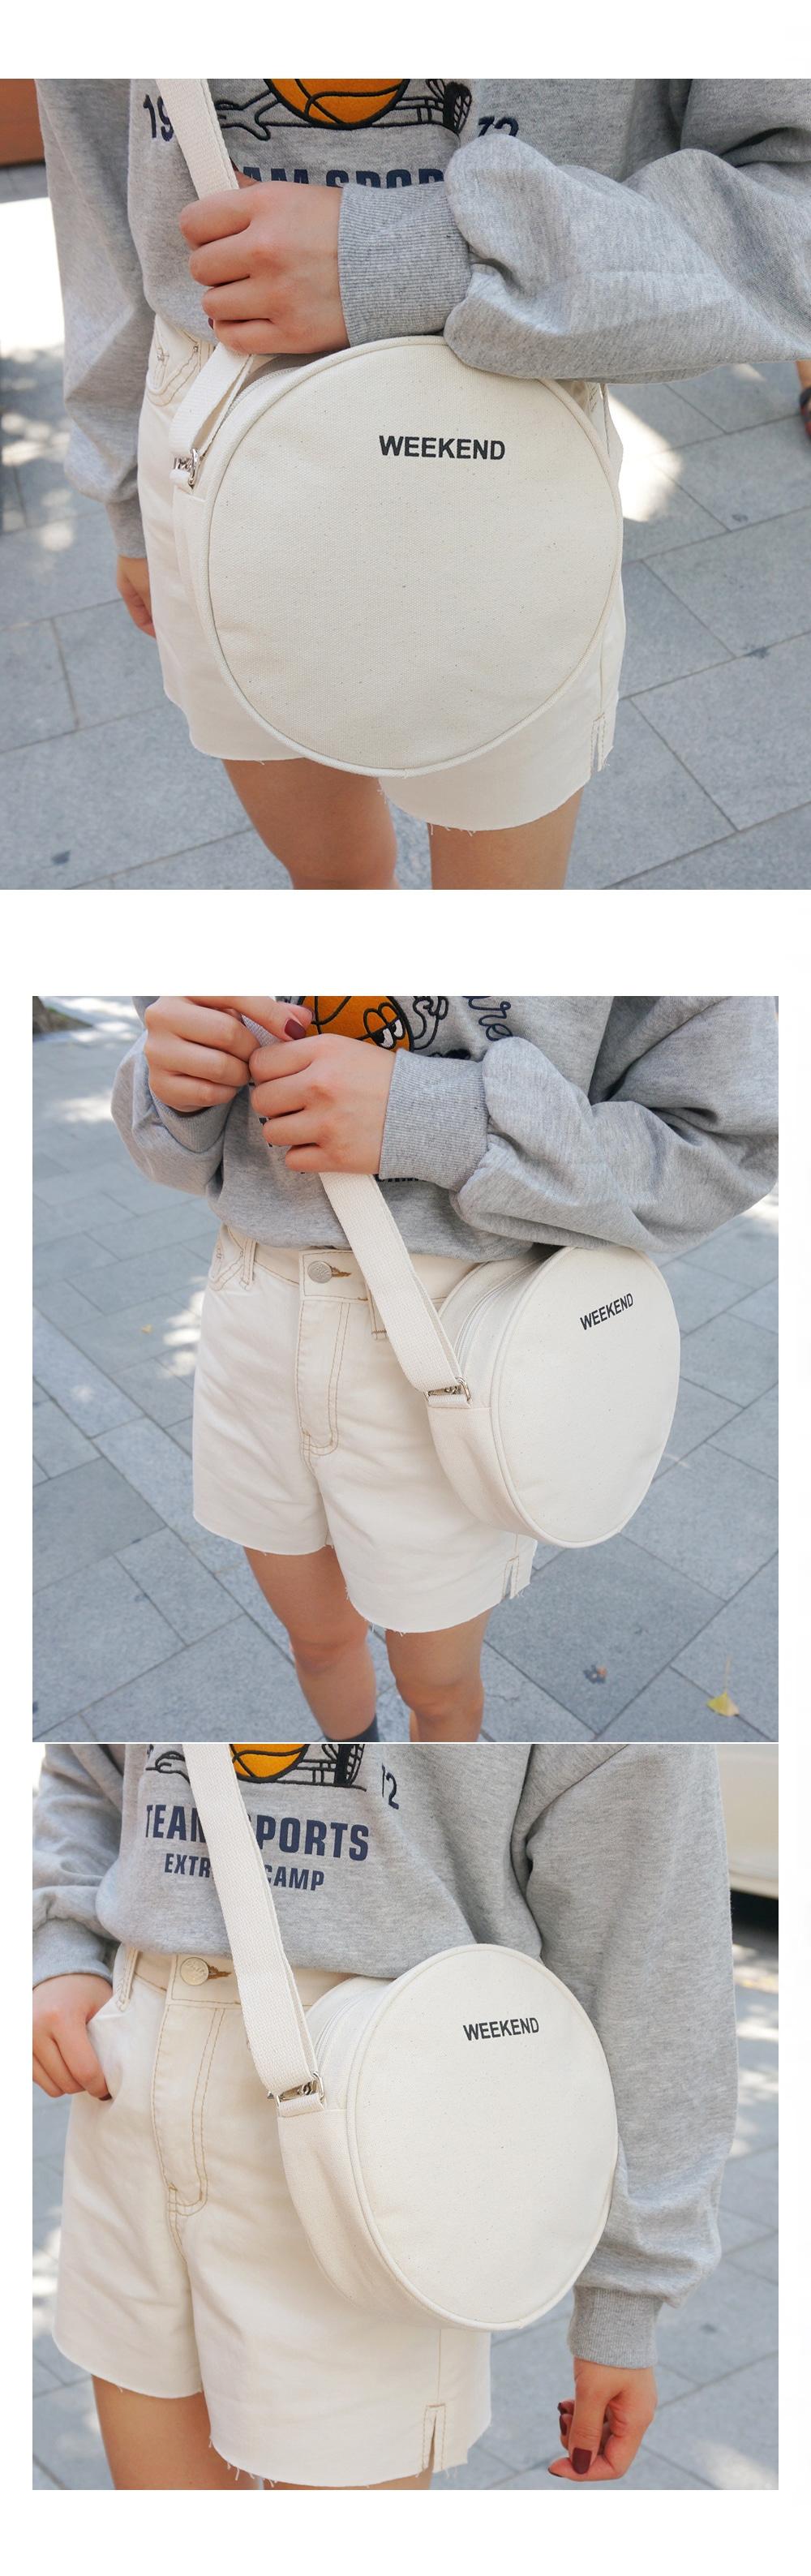 Wealded Tambourine Bag